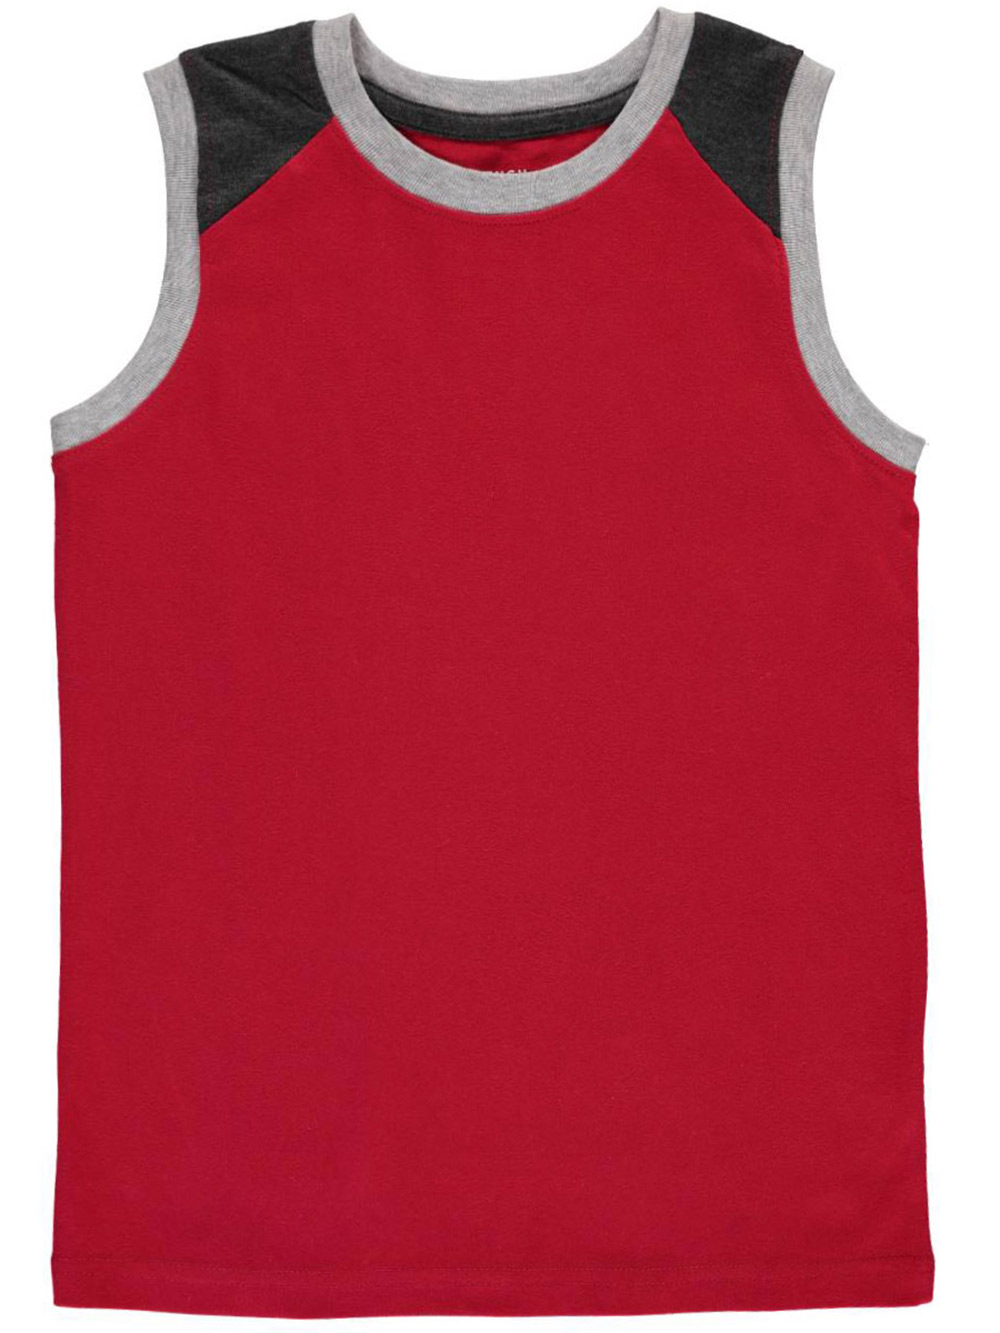 Image of French Toast Big Boys Muscle Sleeveless TShirt Sizes 8  20  red 1012